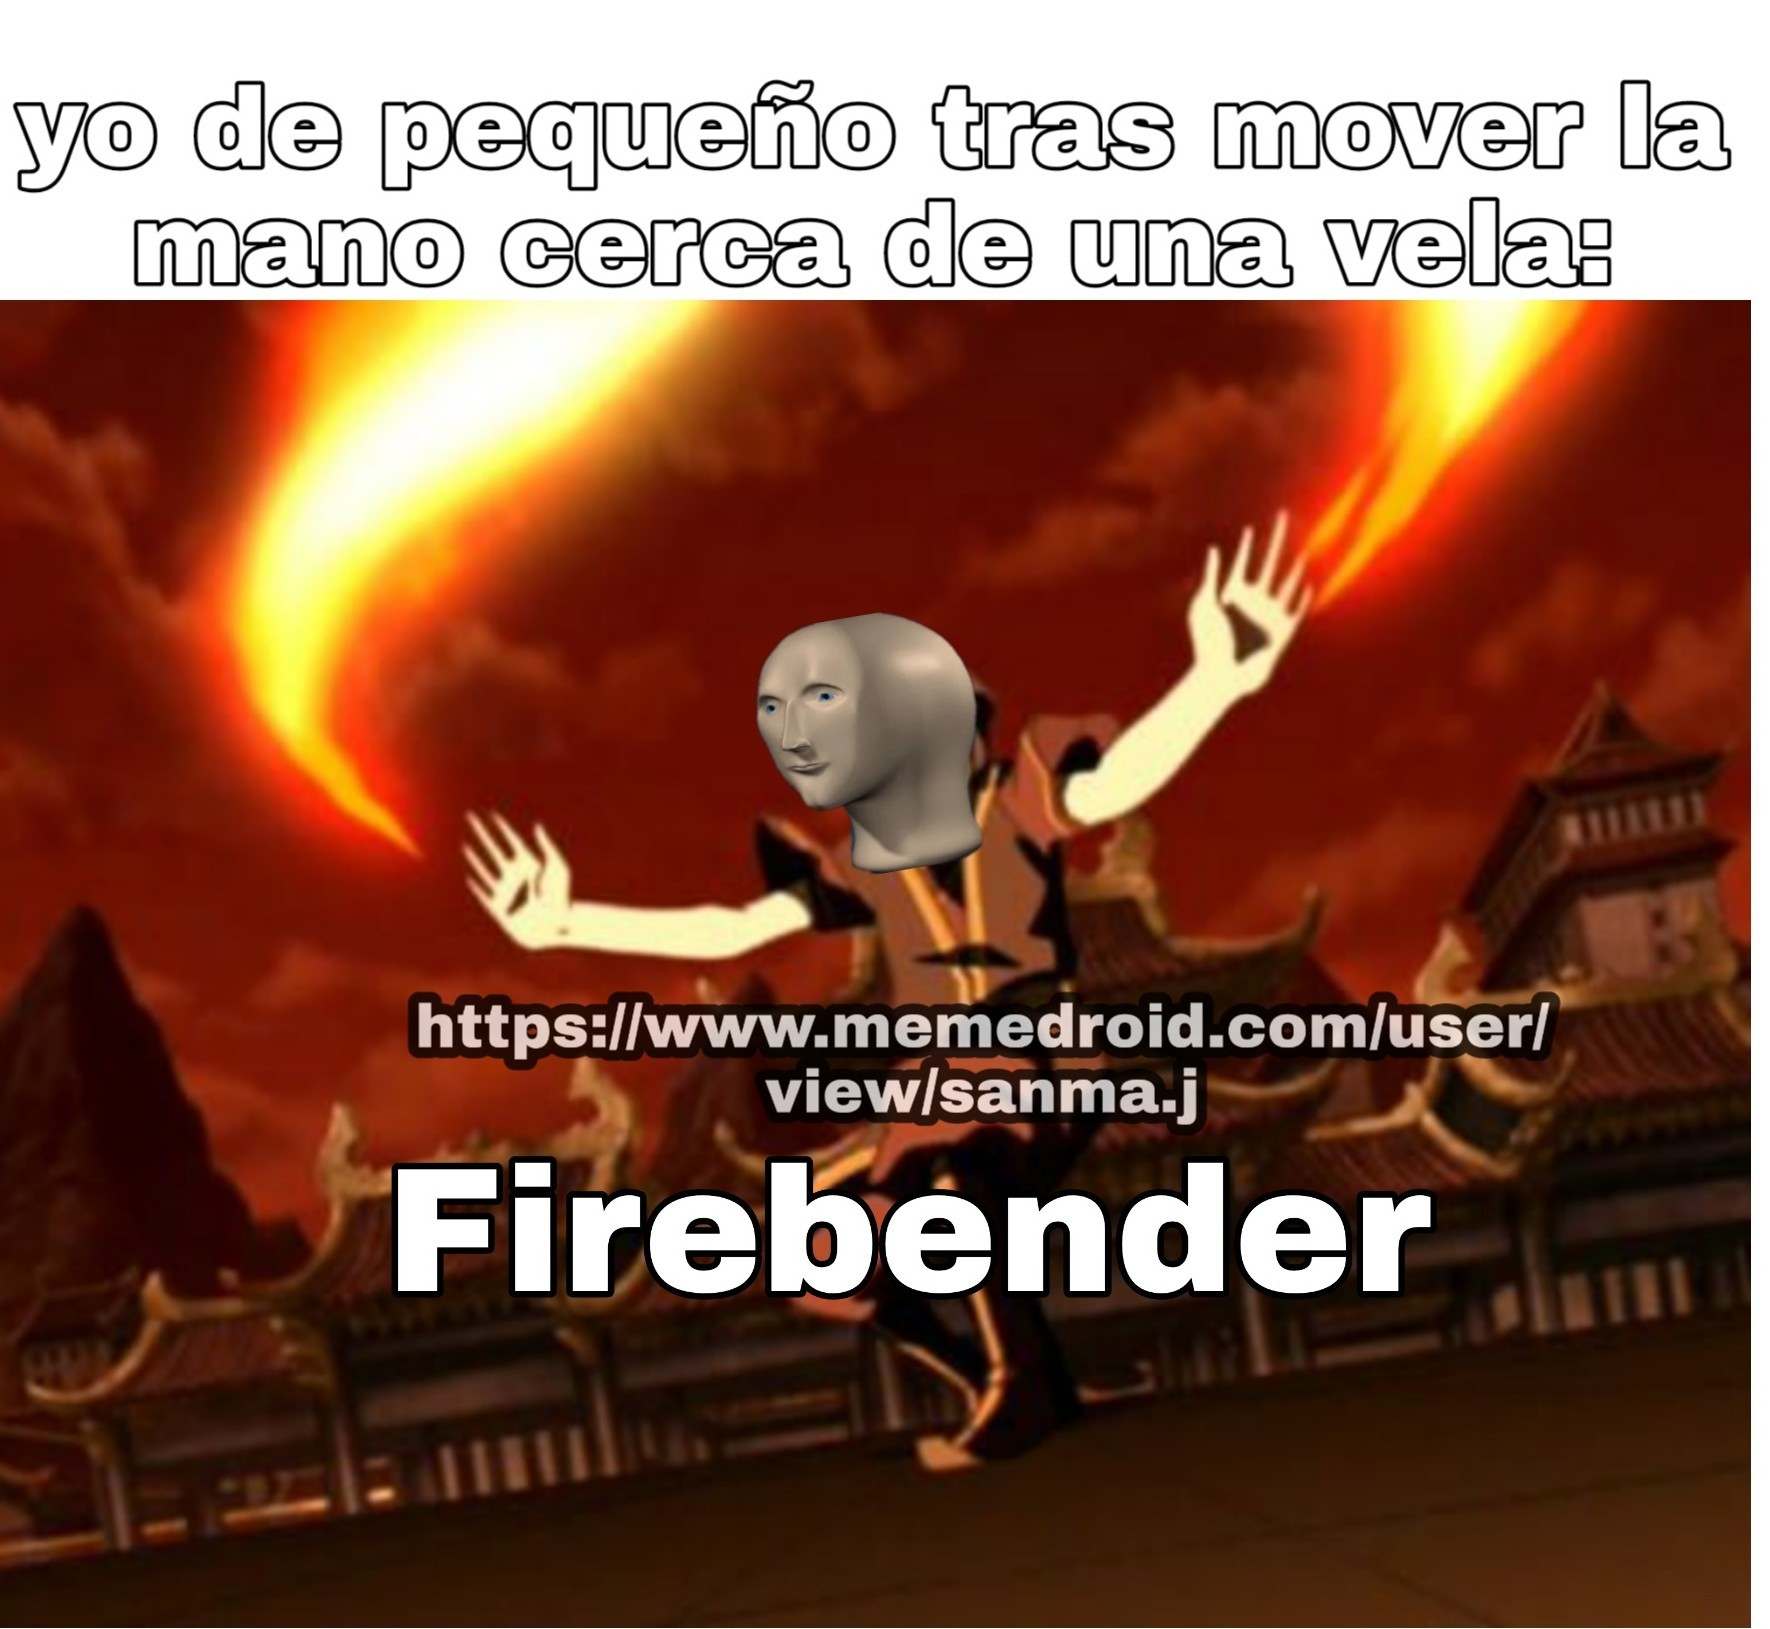 Agua, tierra,fuego, aire - meme